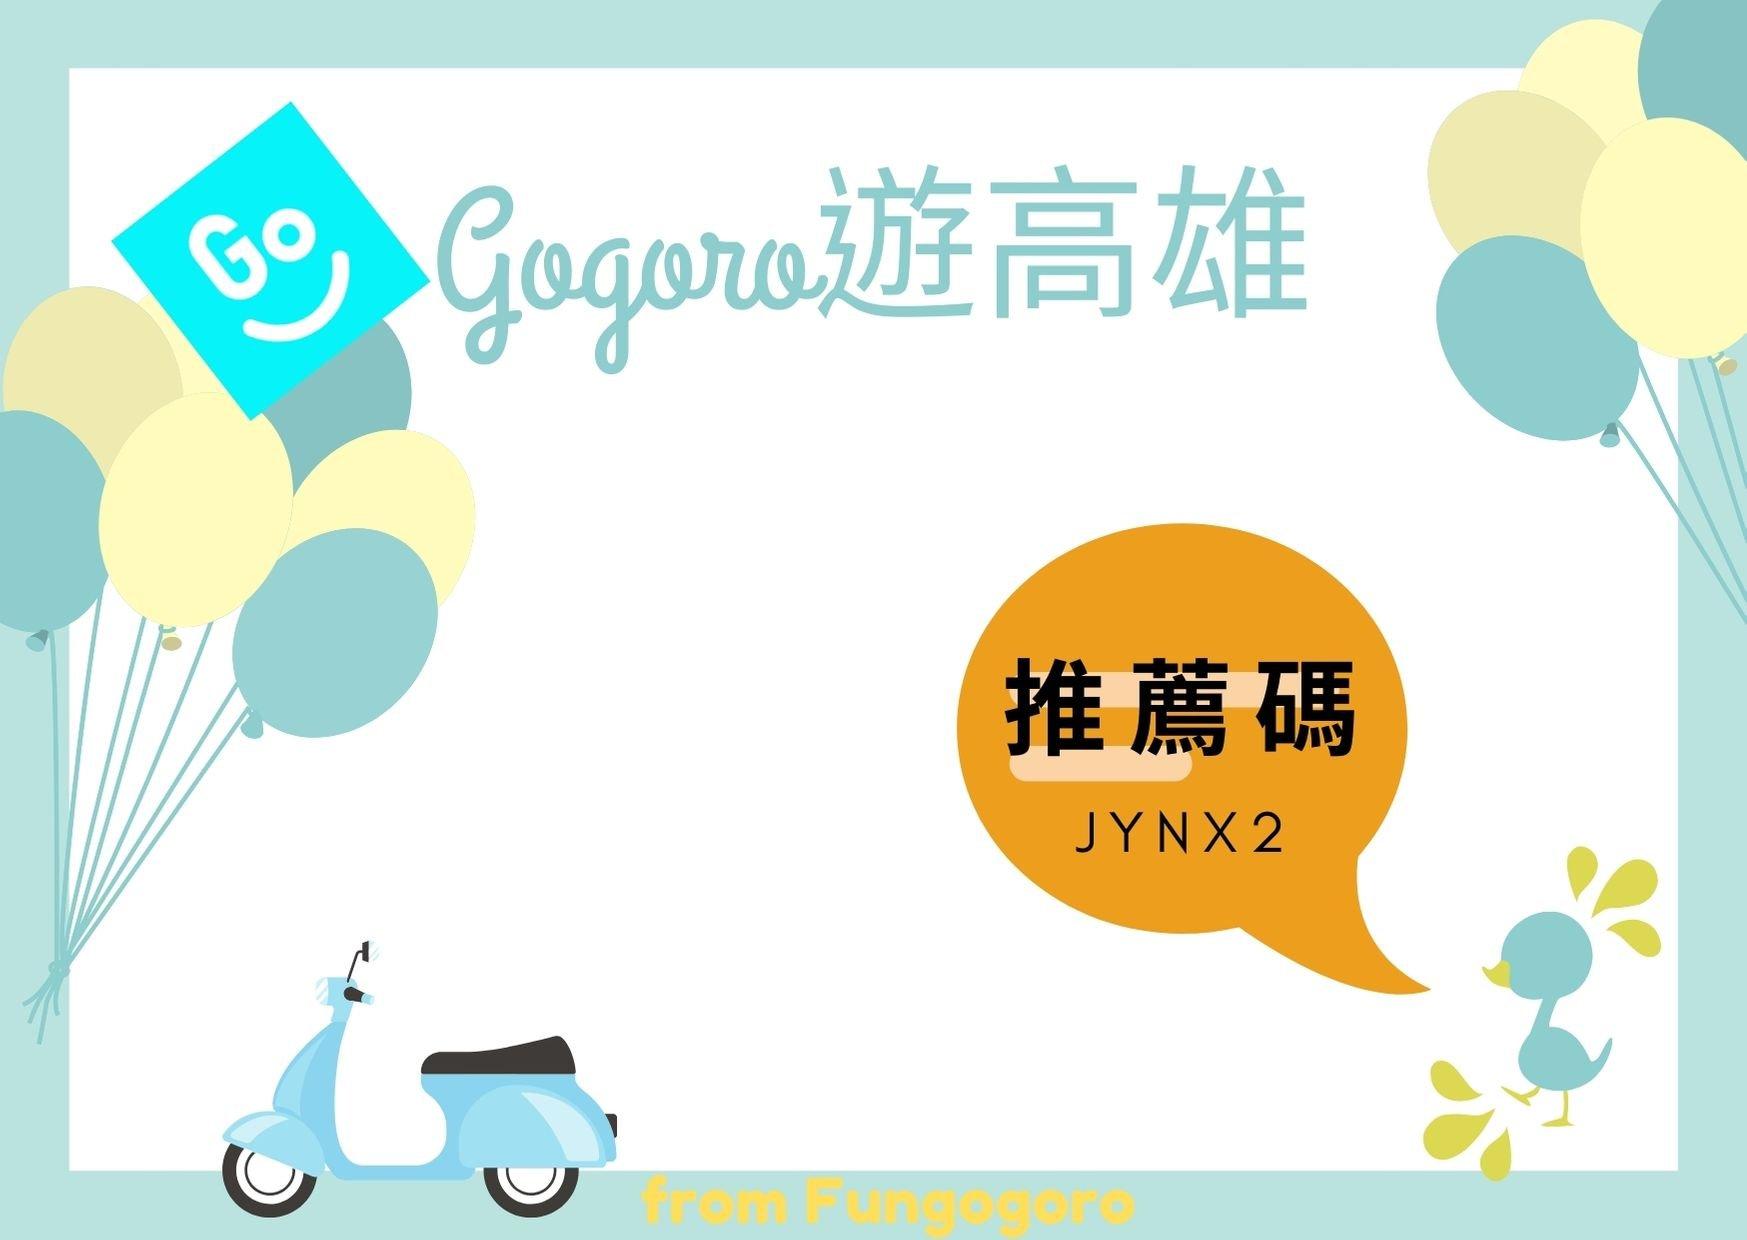 【GoShare租車遊高雄!】你知道開放範圍嗎? 最自由推薦的旅遊交通!贈免費騎乘點數!